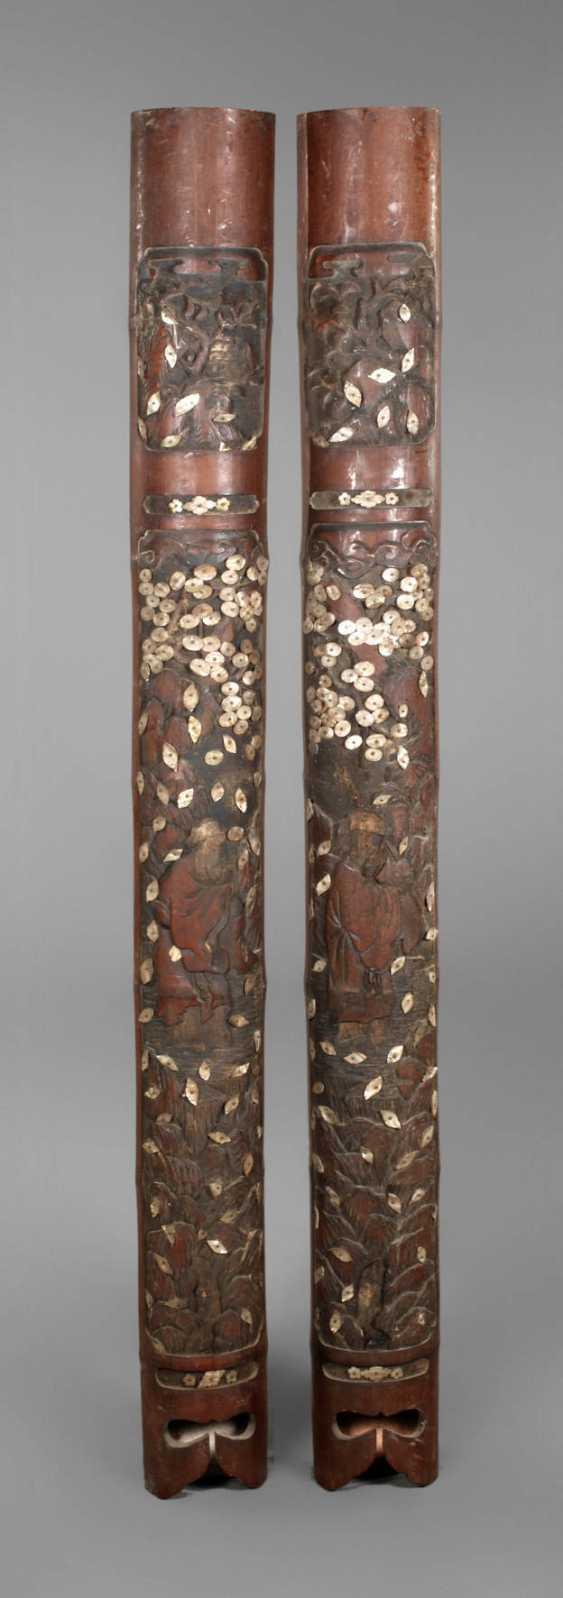 Pair Of Half Columns - photo 1